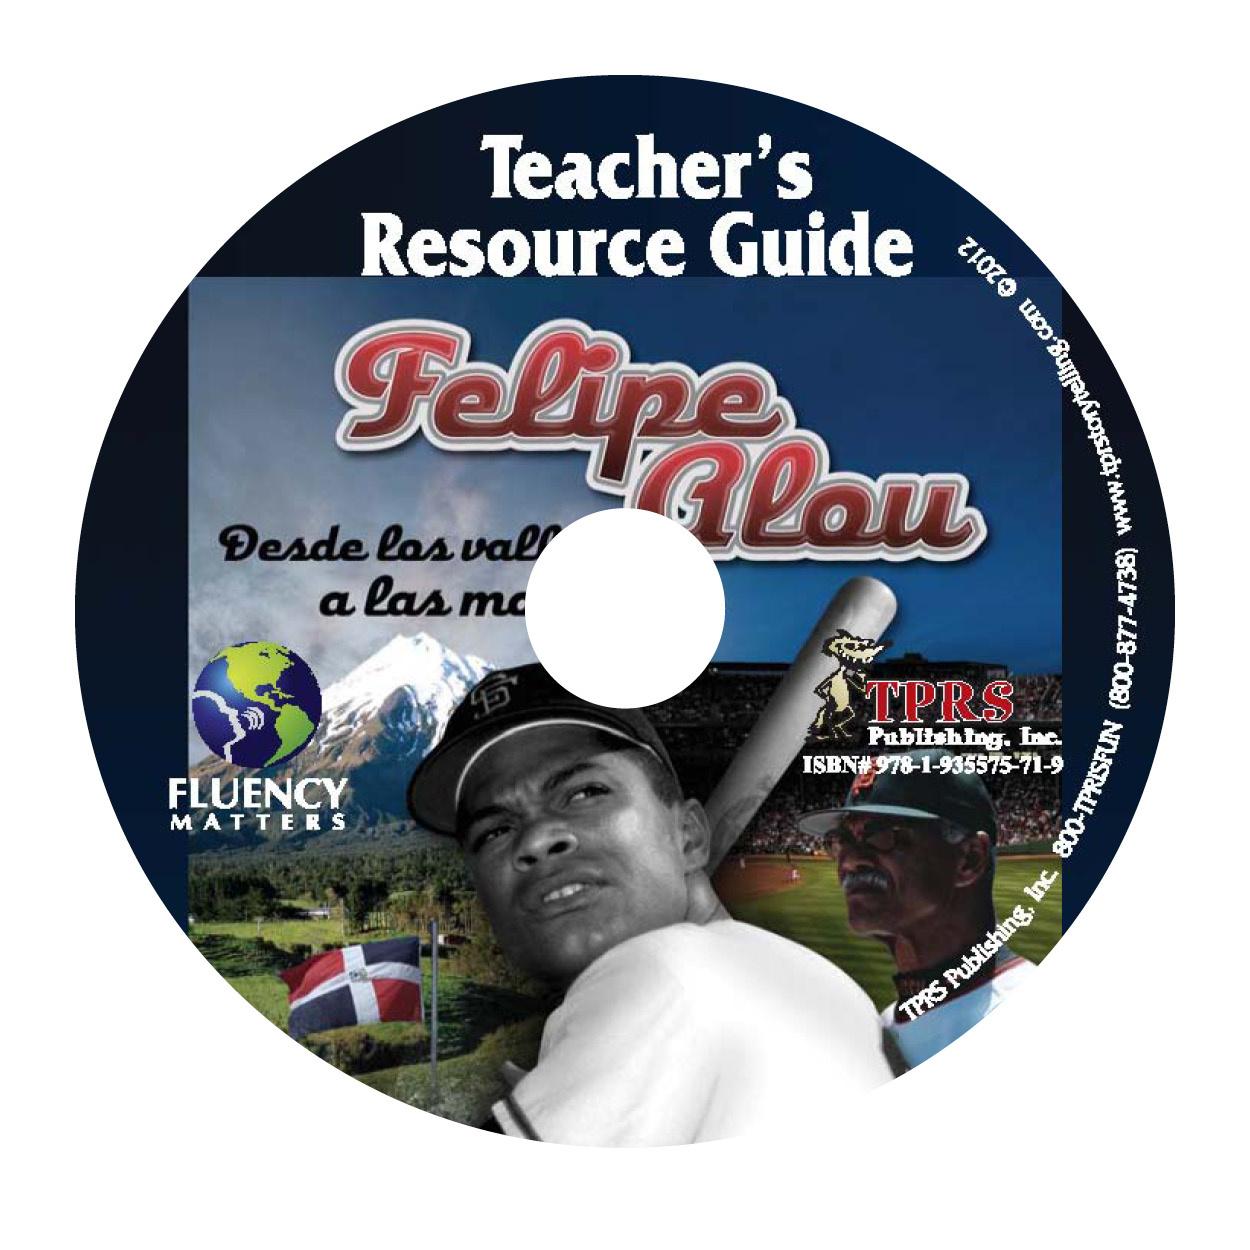 Felipe Alou - Desde los valles a las montañas   - Teacher's Guide